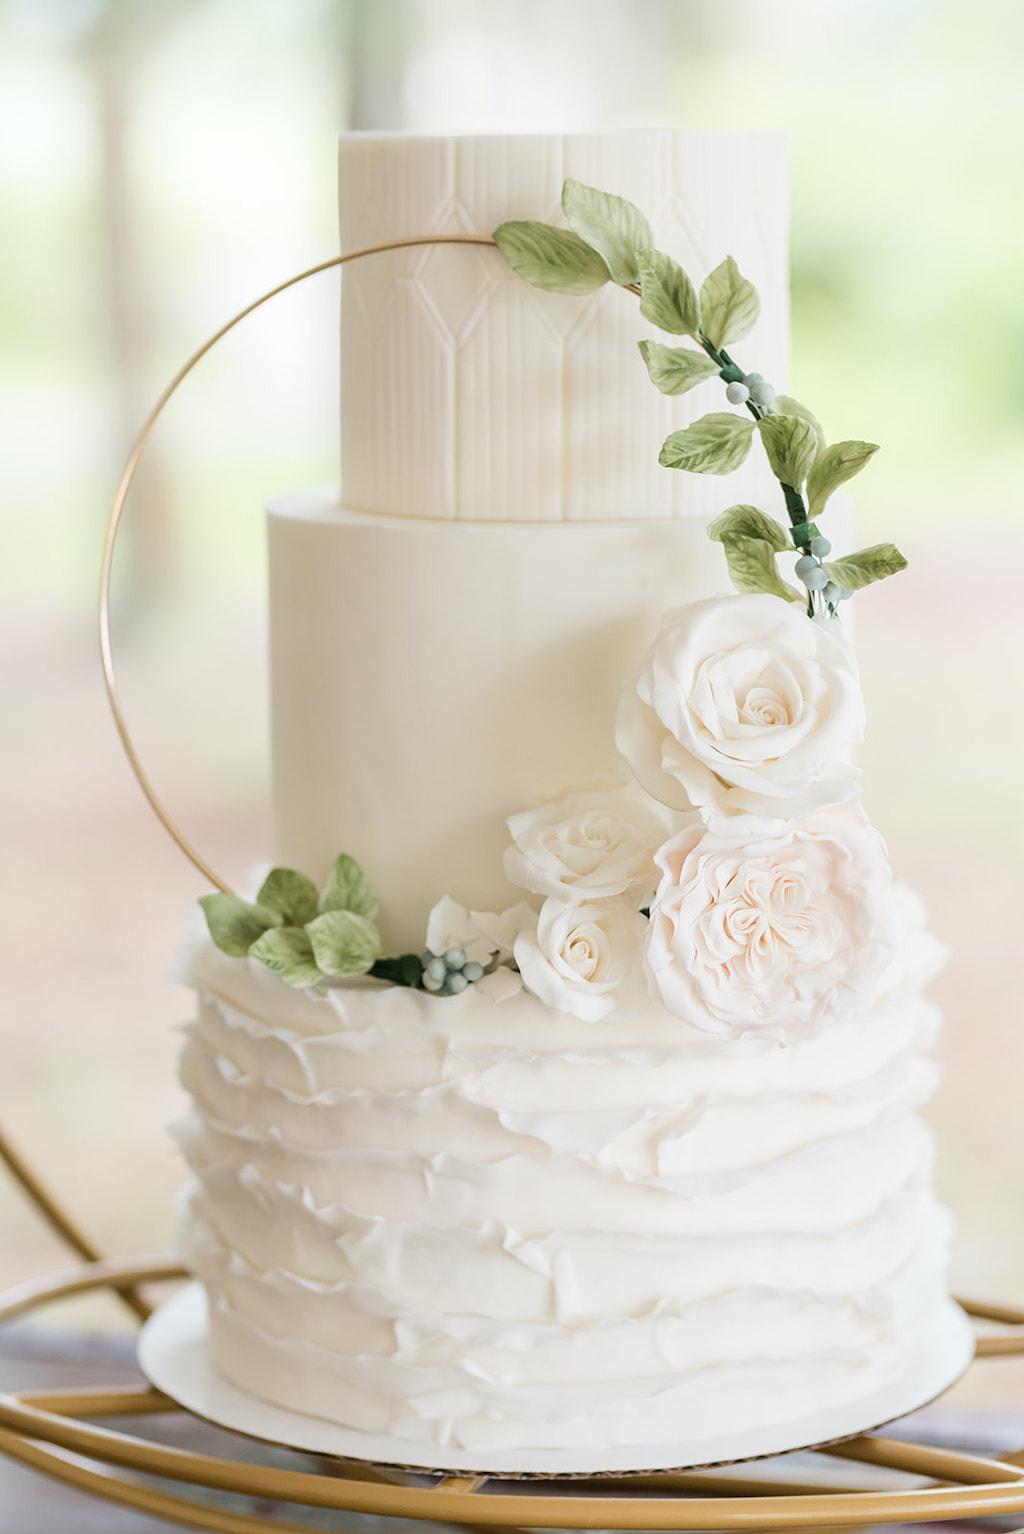 Sensational Tampa Wedding Cakes And Desserts Tampa Bay Cake Company Dusty Personalised Birthday Cards Veneteletsinfo